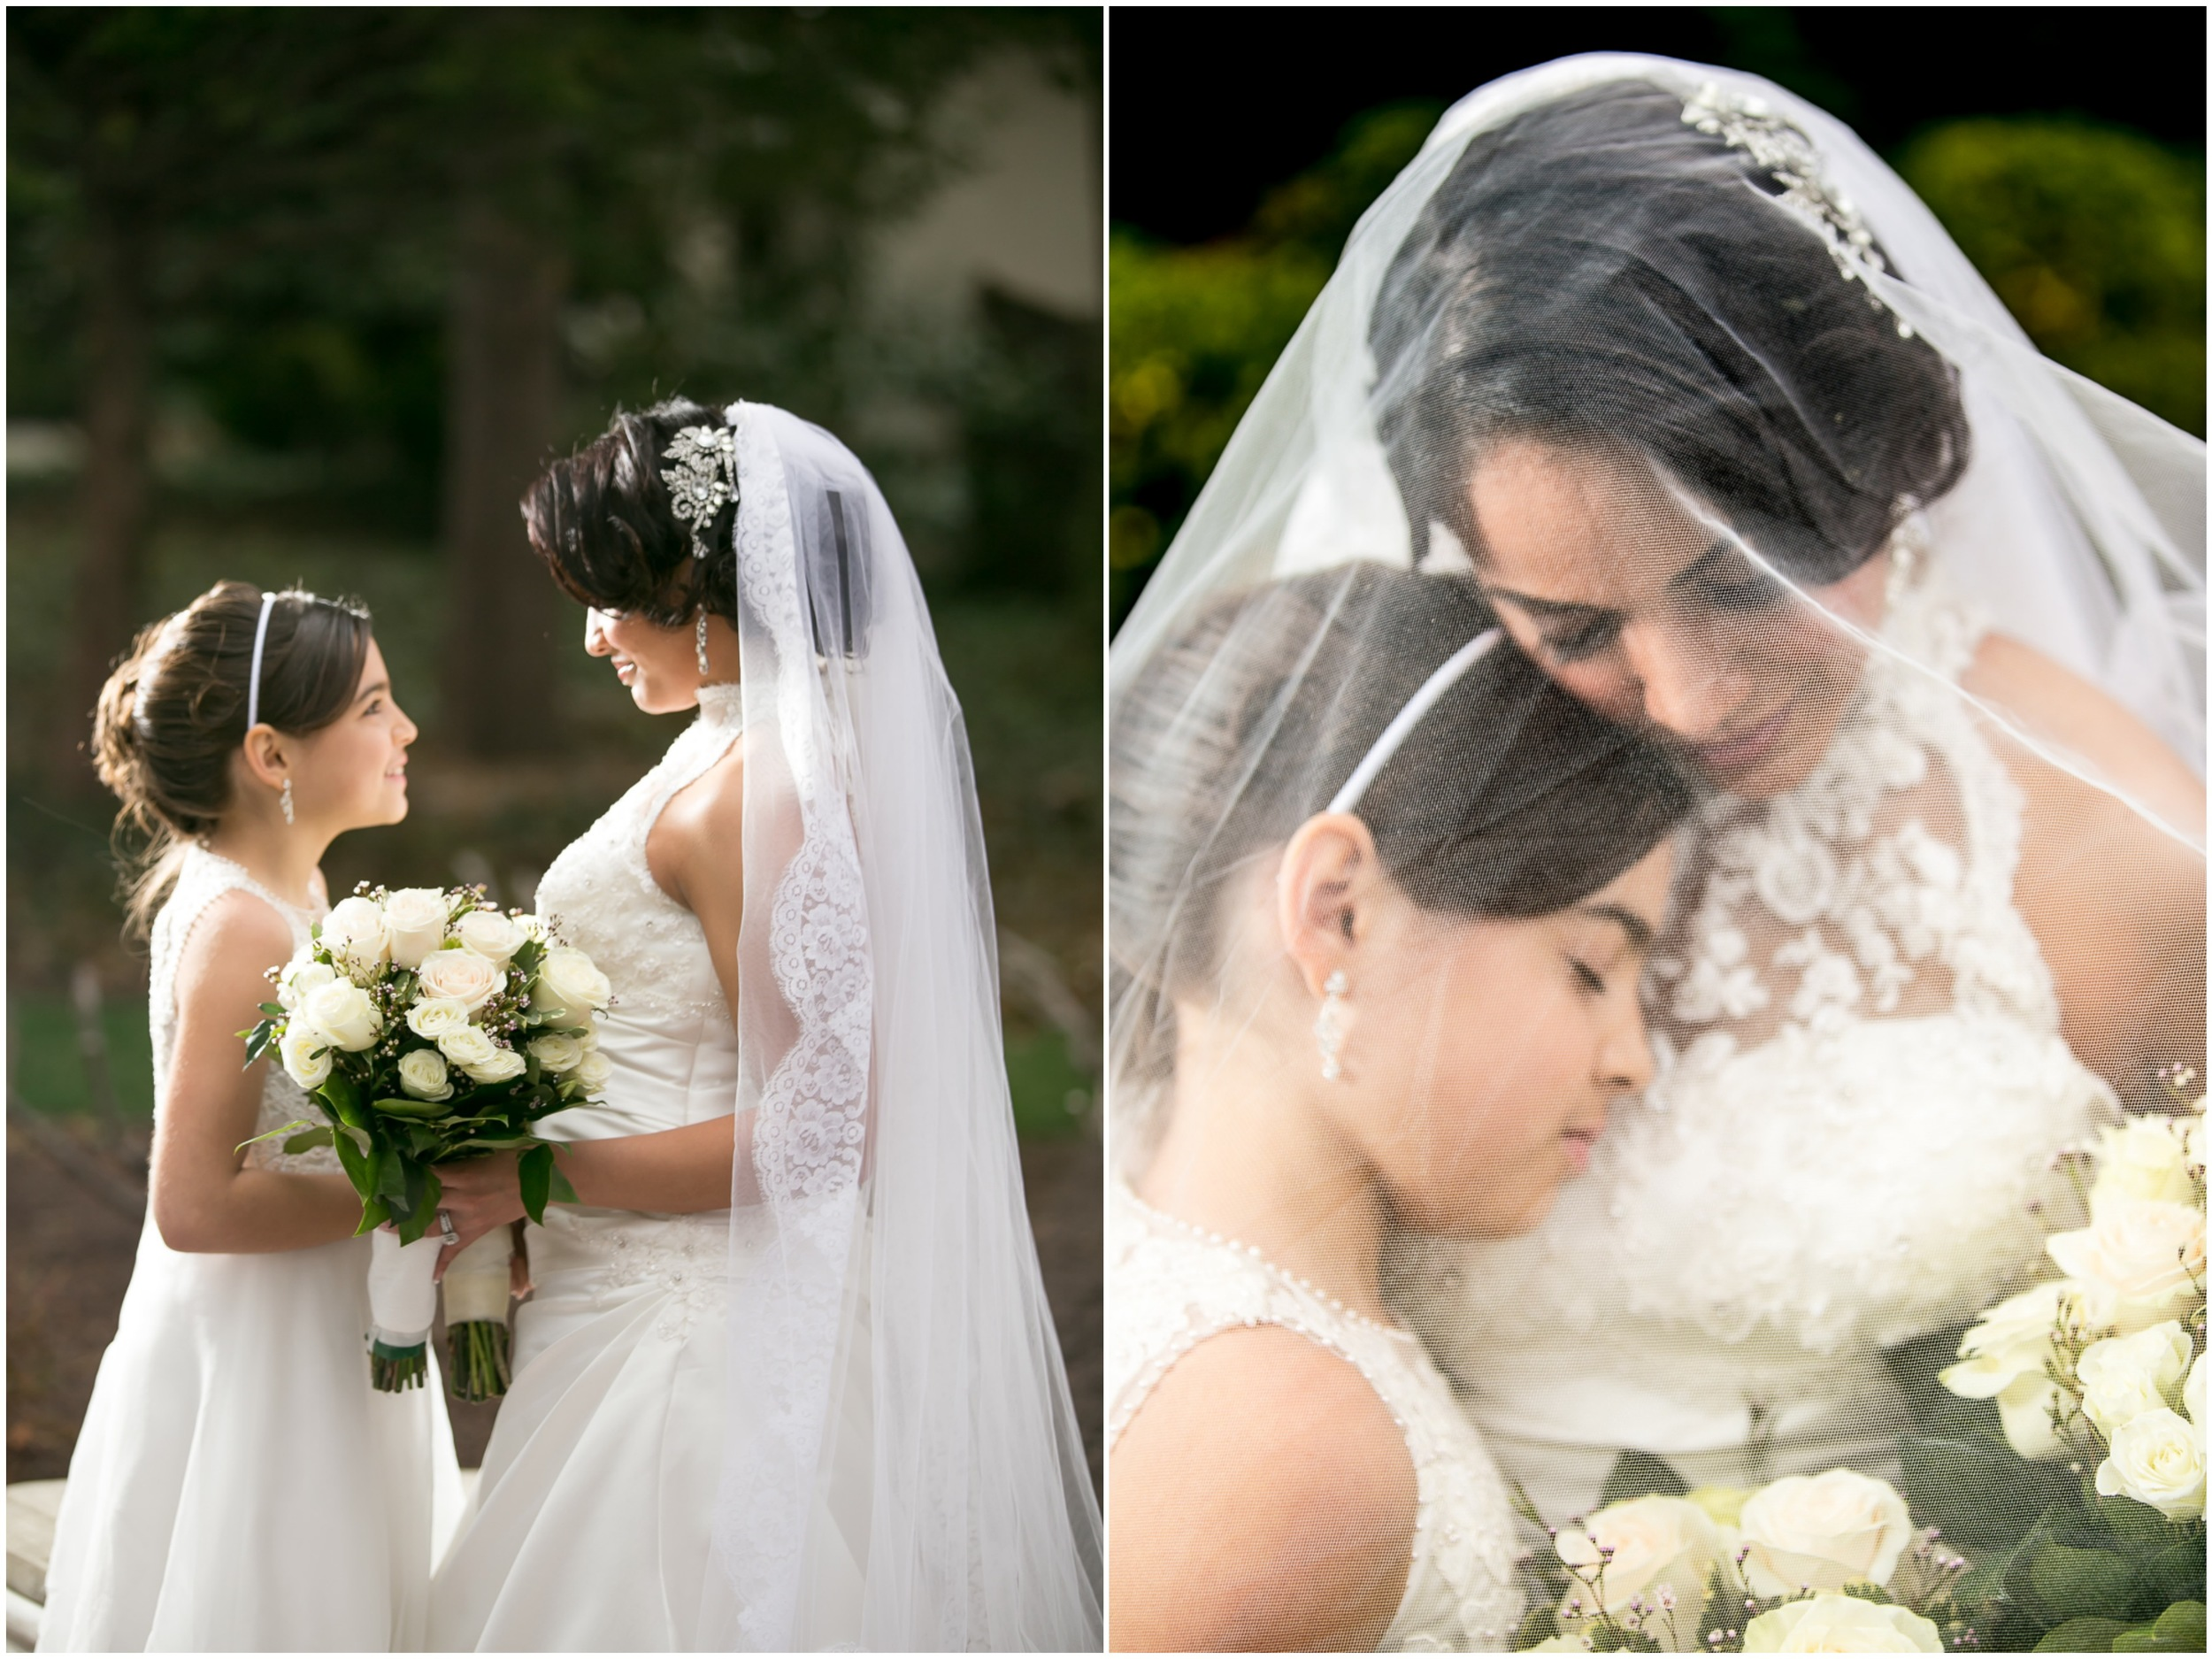 Bradly-and-Jesenia-Wedding-Collage-20.jpg